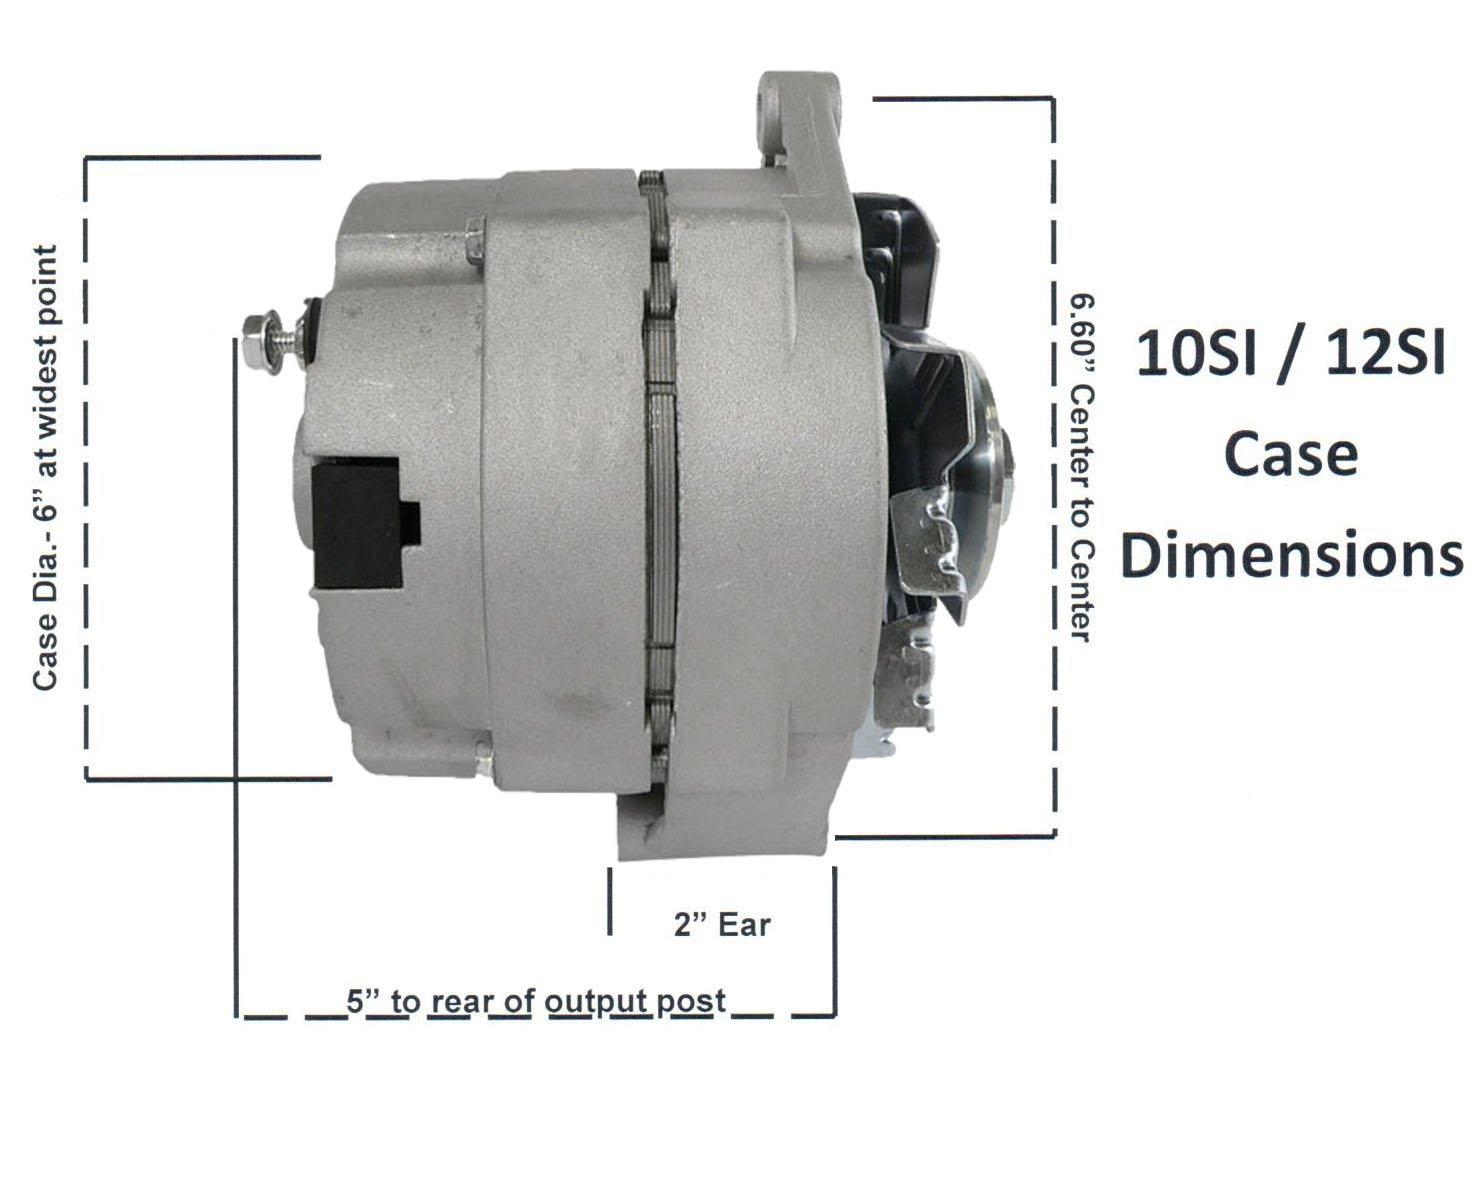 Wiring Diagram Also Acdelco Alternator Wiring Diagram On 10si Wiring